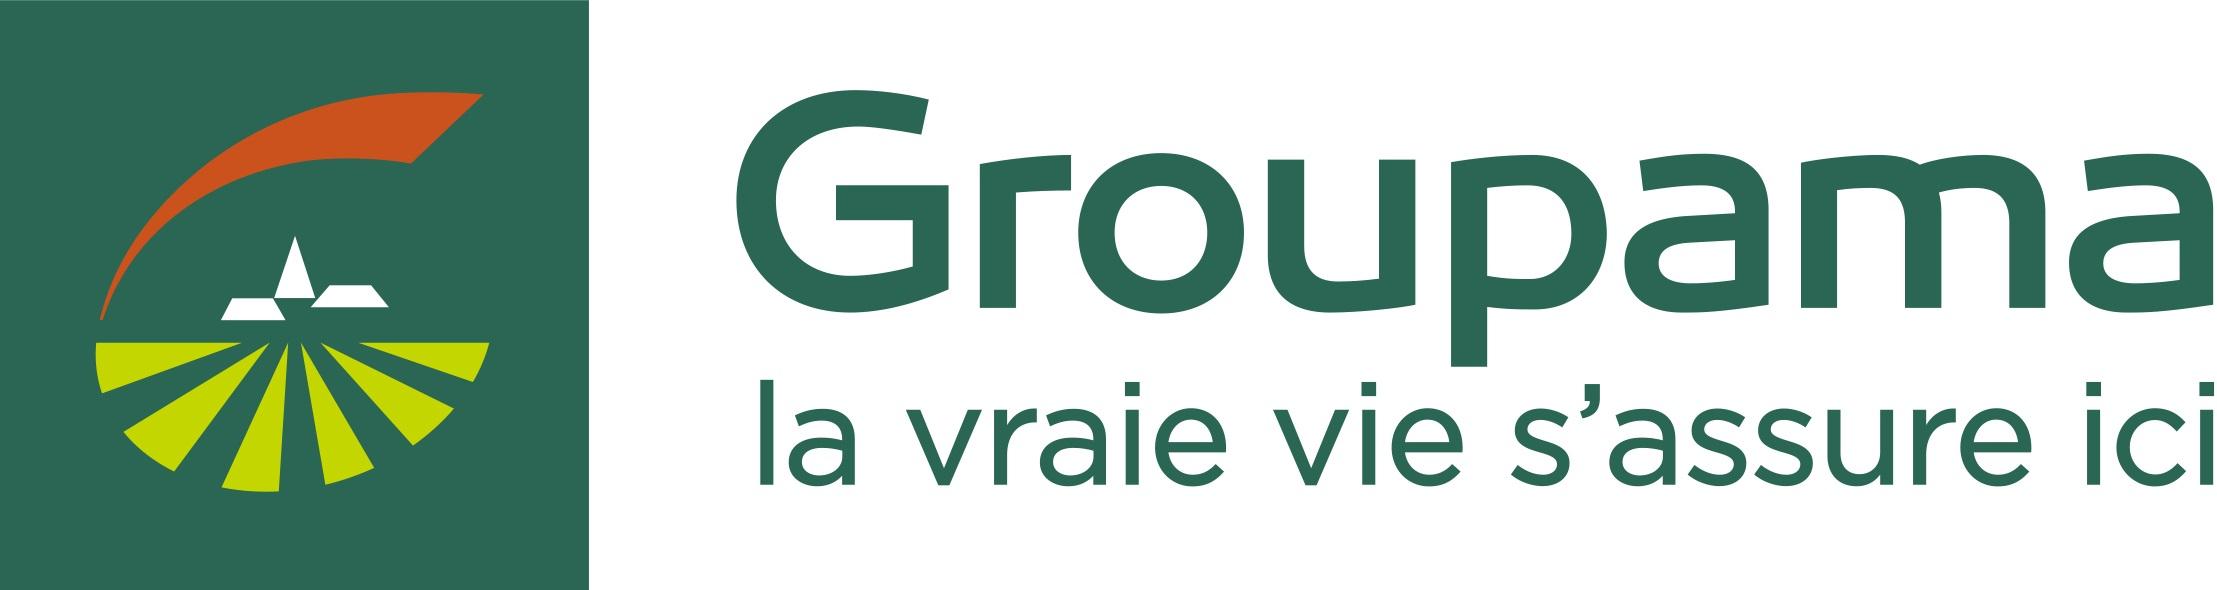 https://www.traiteur-biarritz.fr/img/img/logos-clients/logo-groupama.jpg